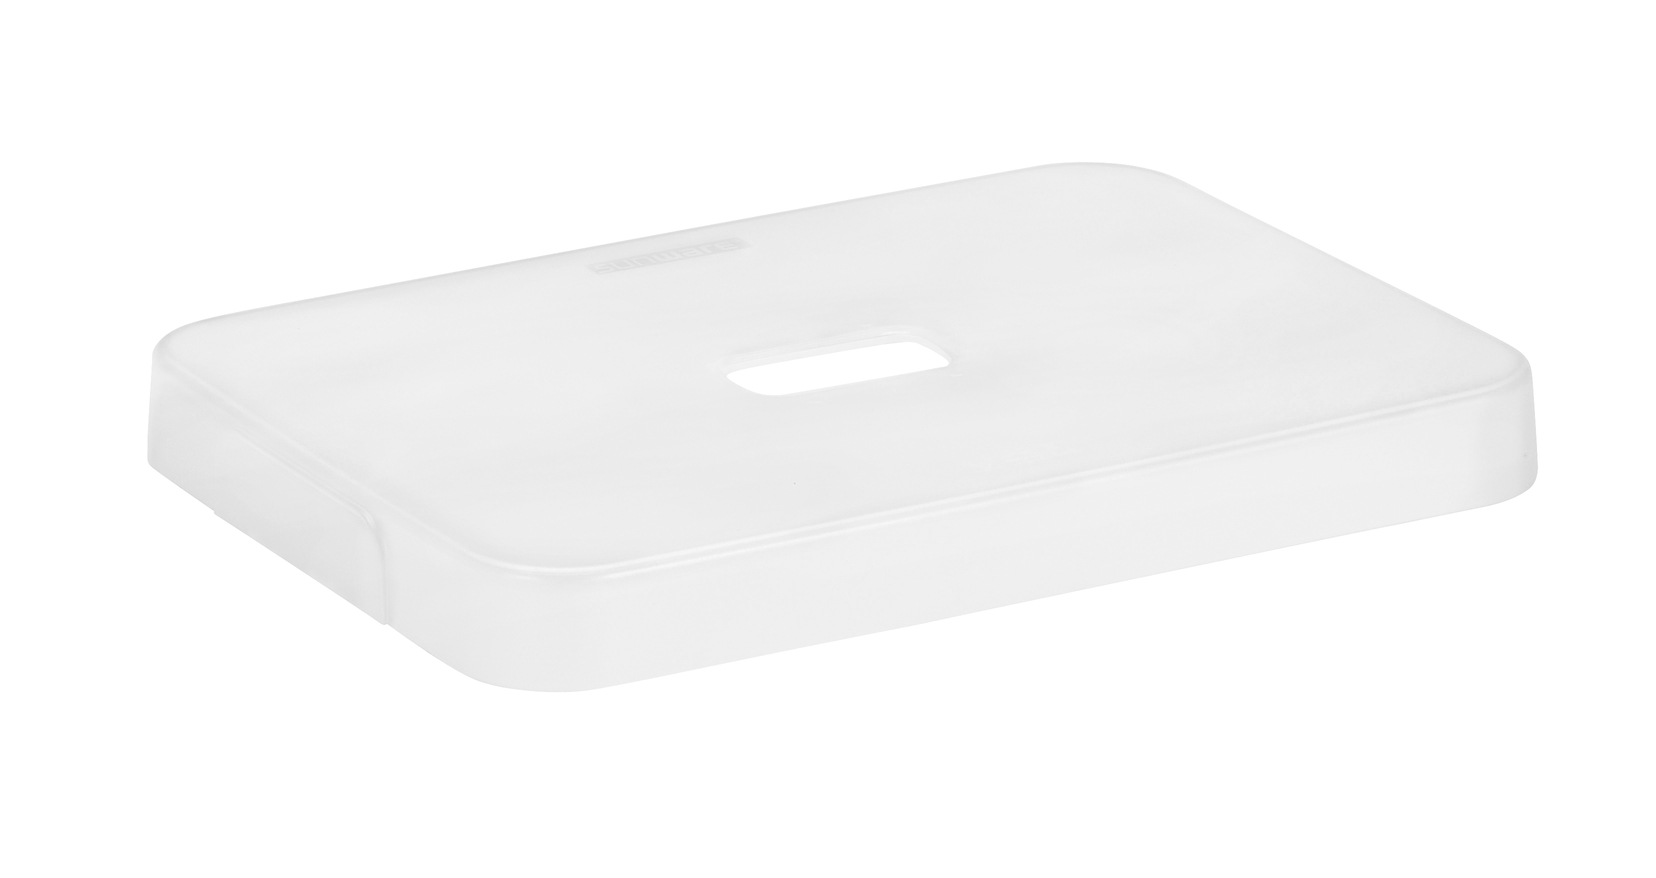 sunware-sigma-home-deksel-voor-box-13-of-25-ltr-transparant